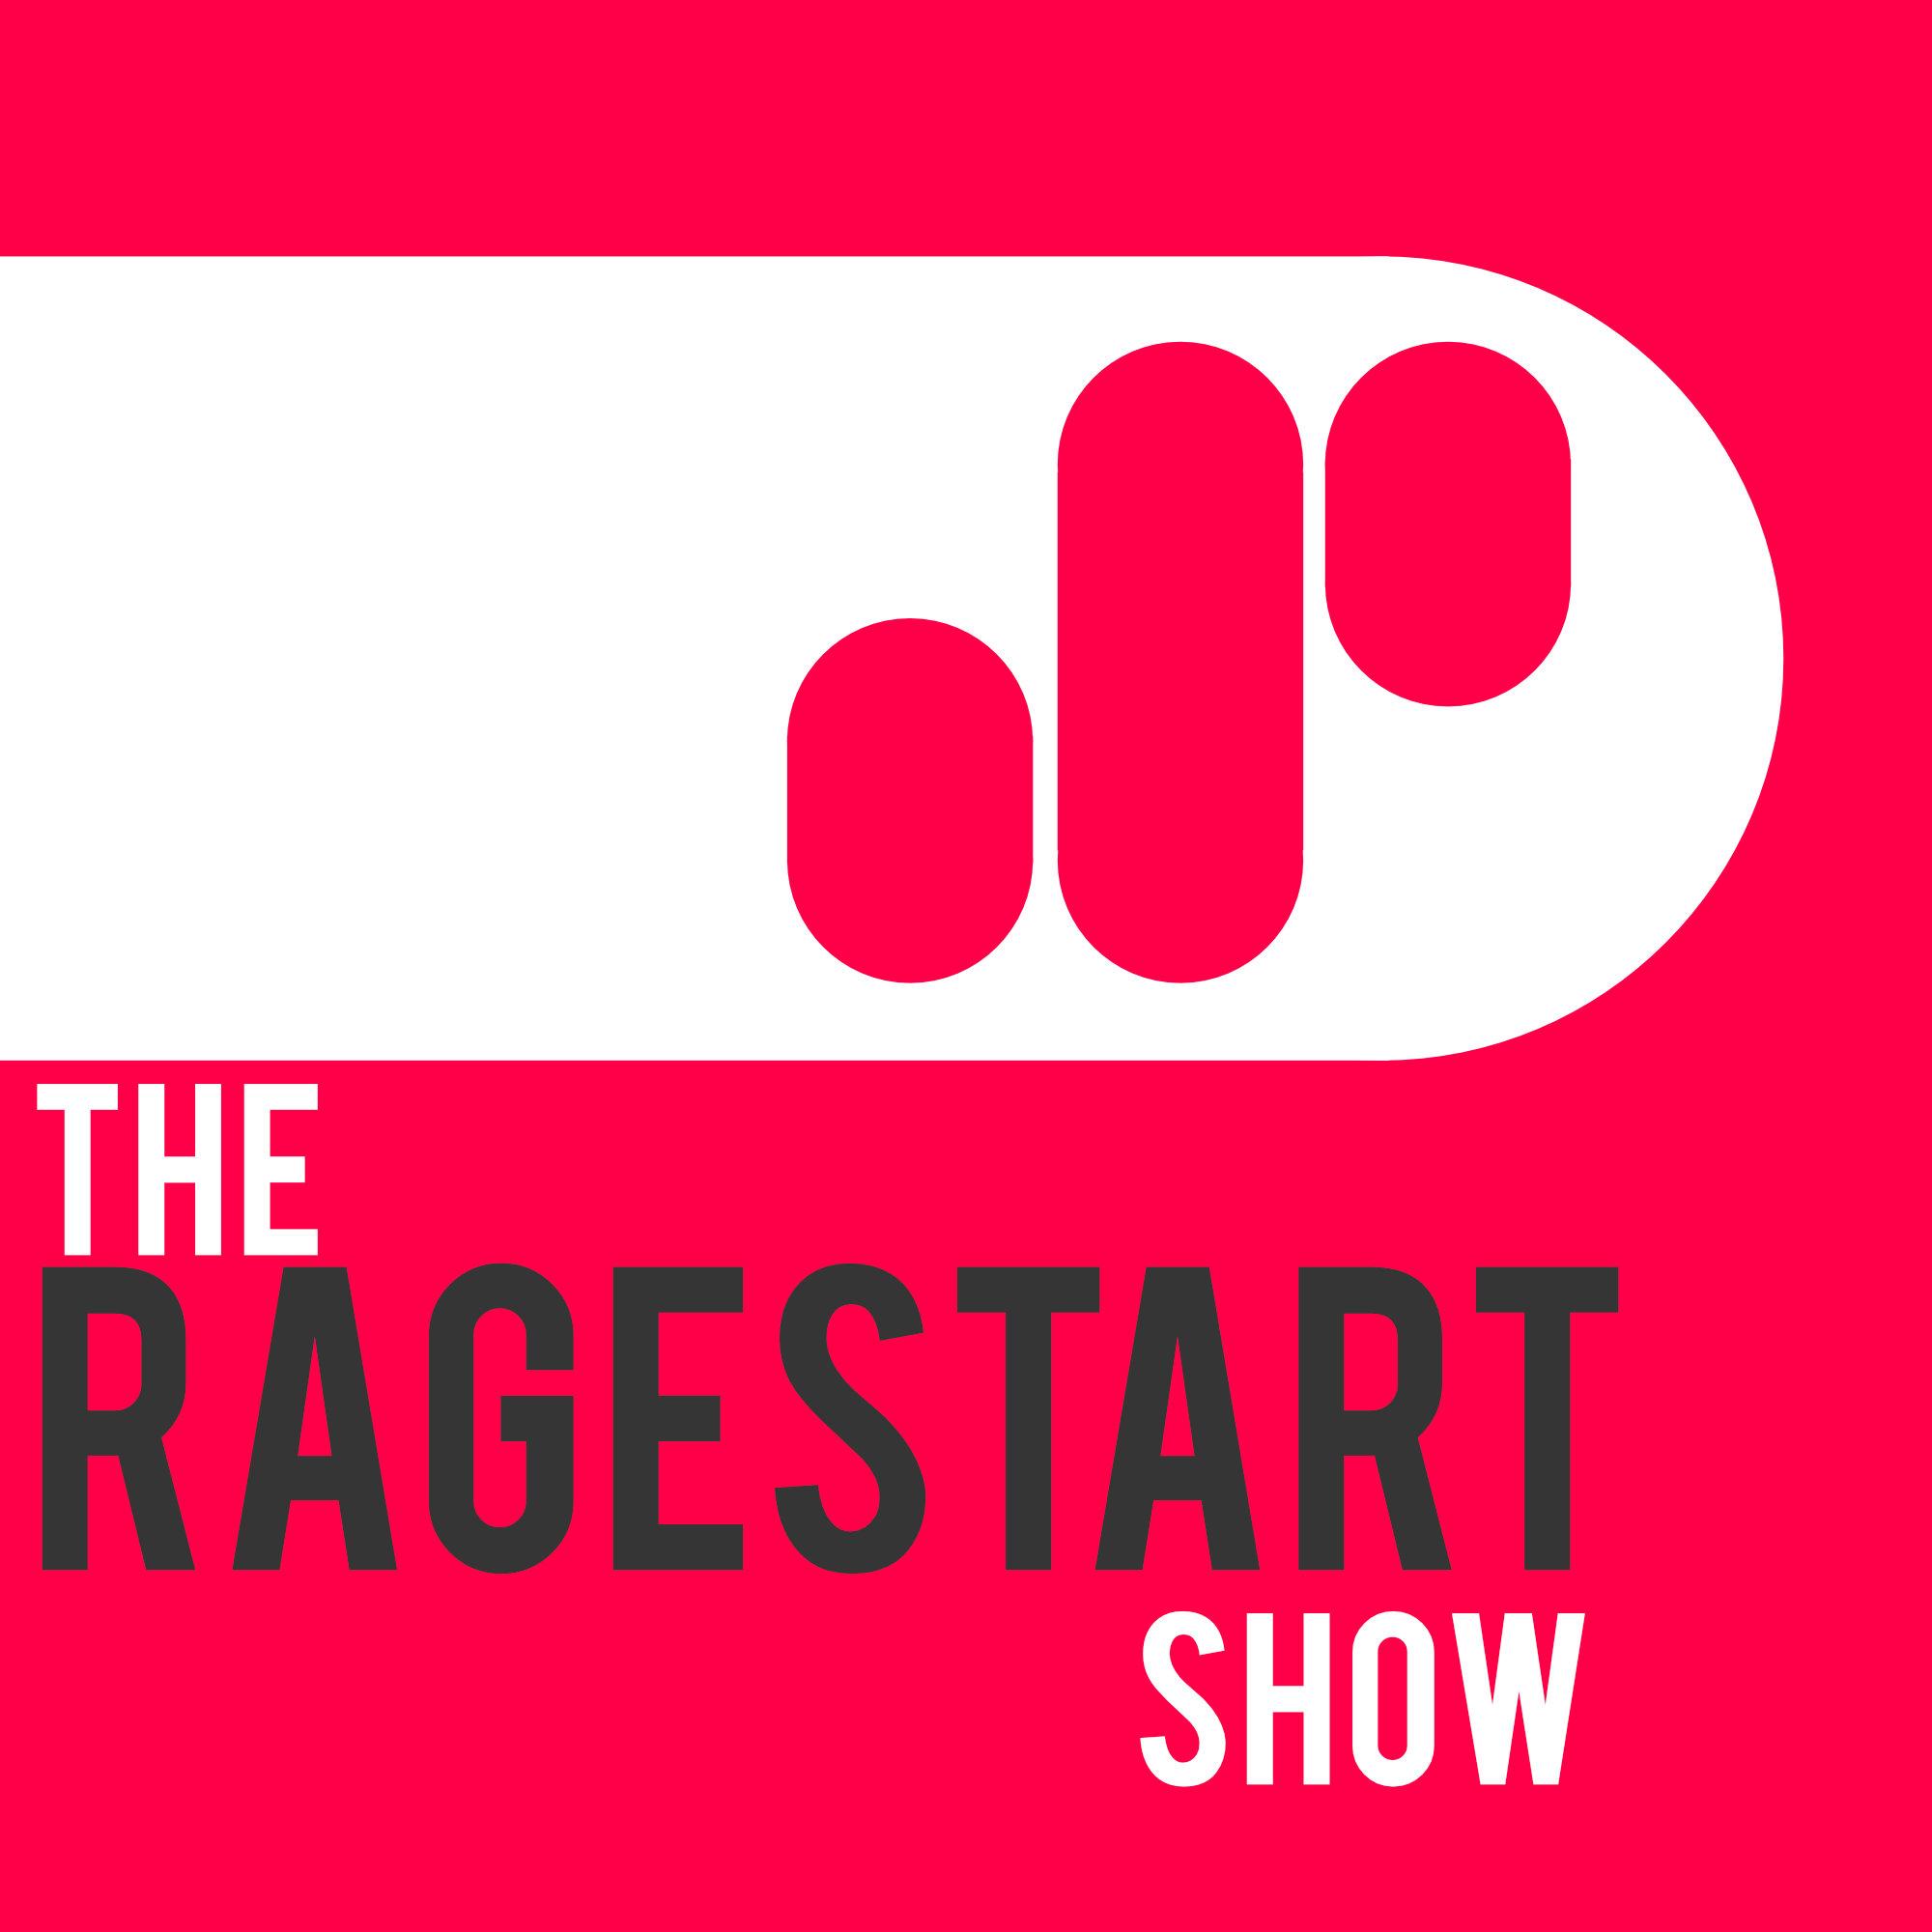 Ragestart Show Thumb final.jpg